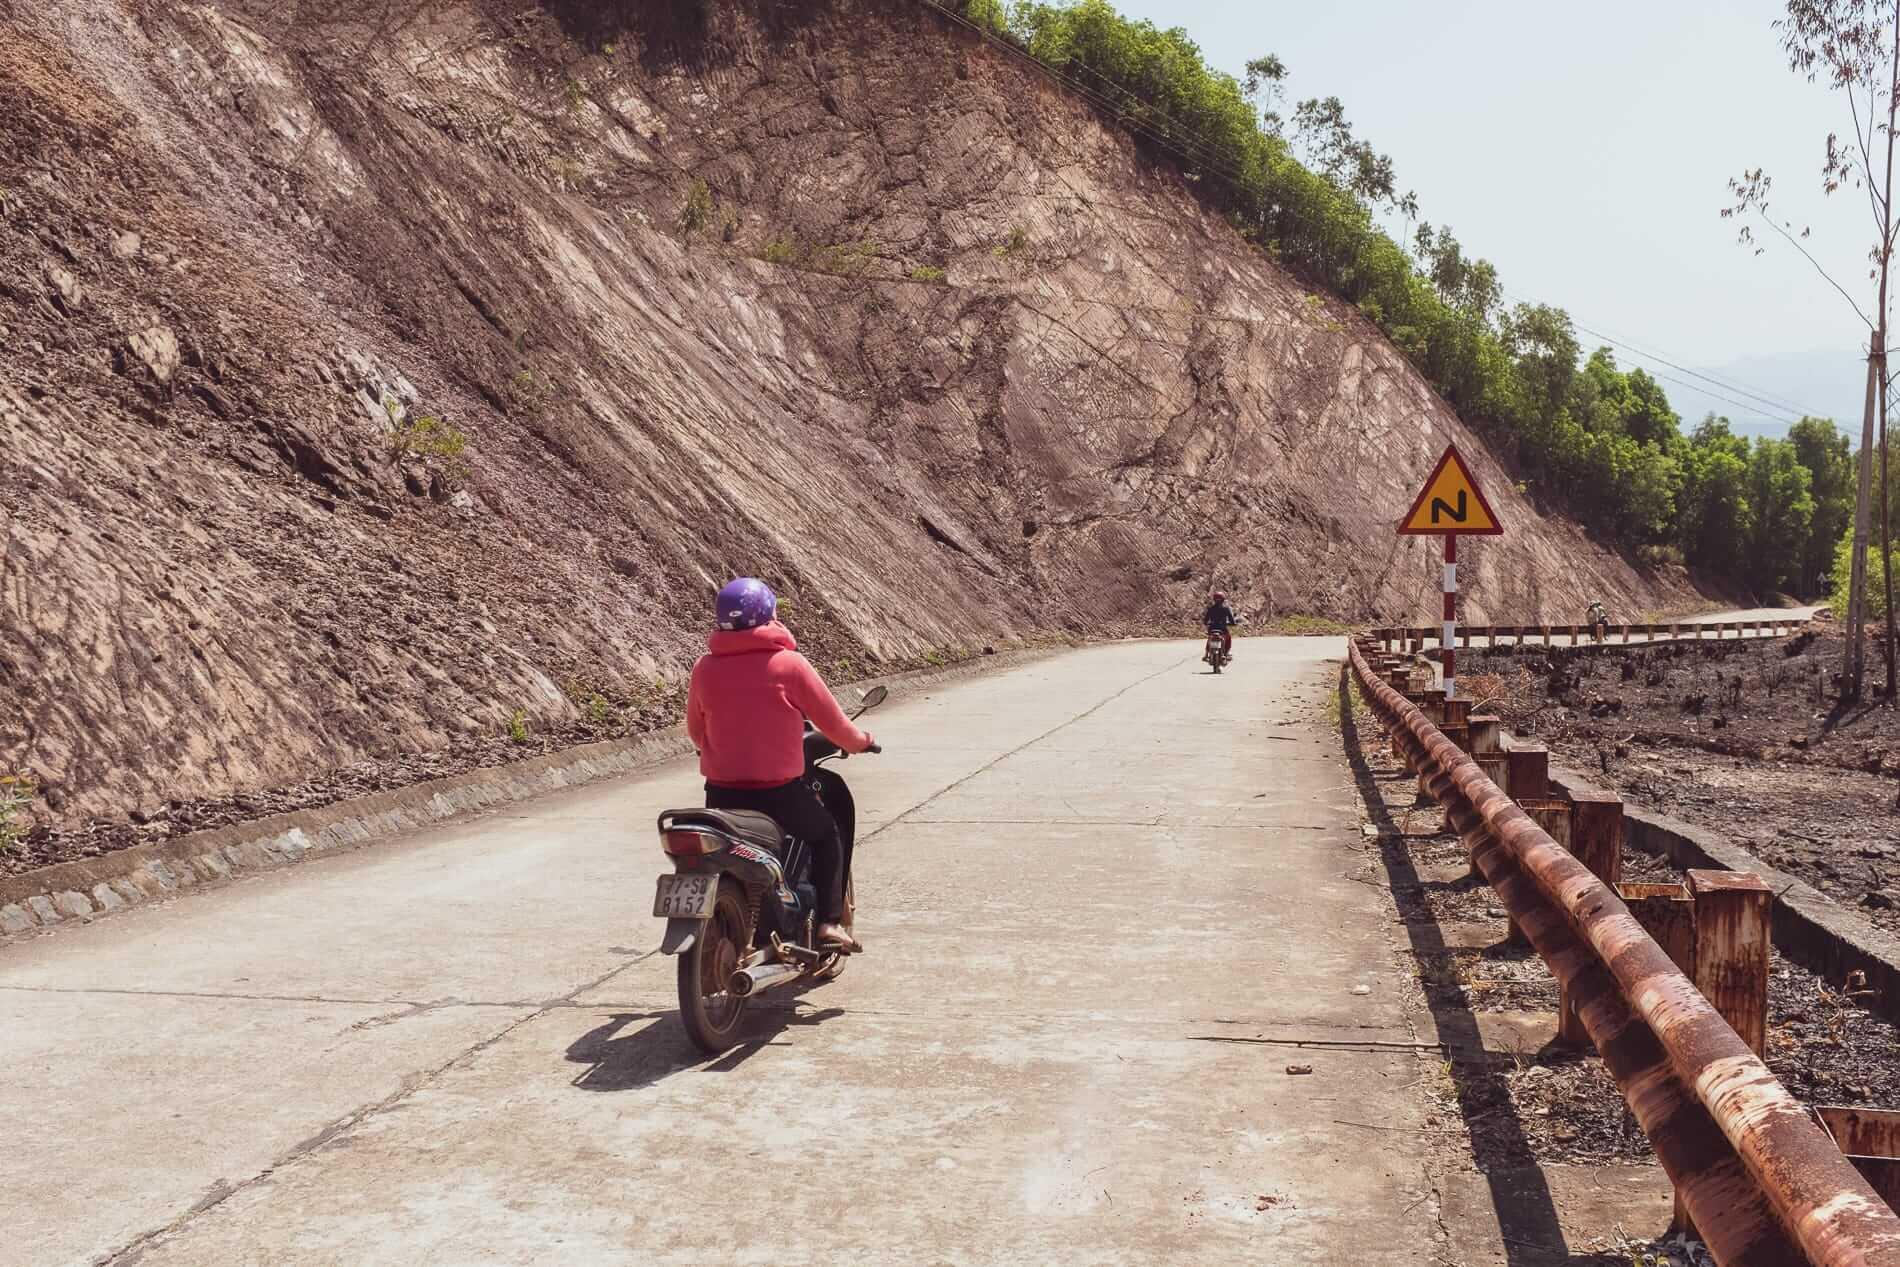 Motorbikes on mountain roads